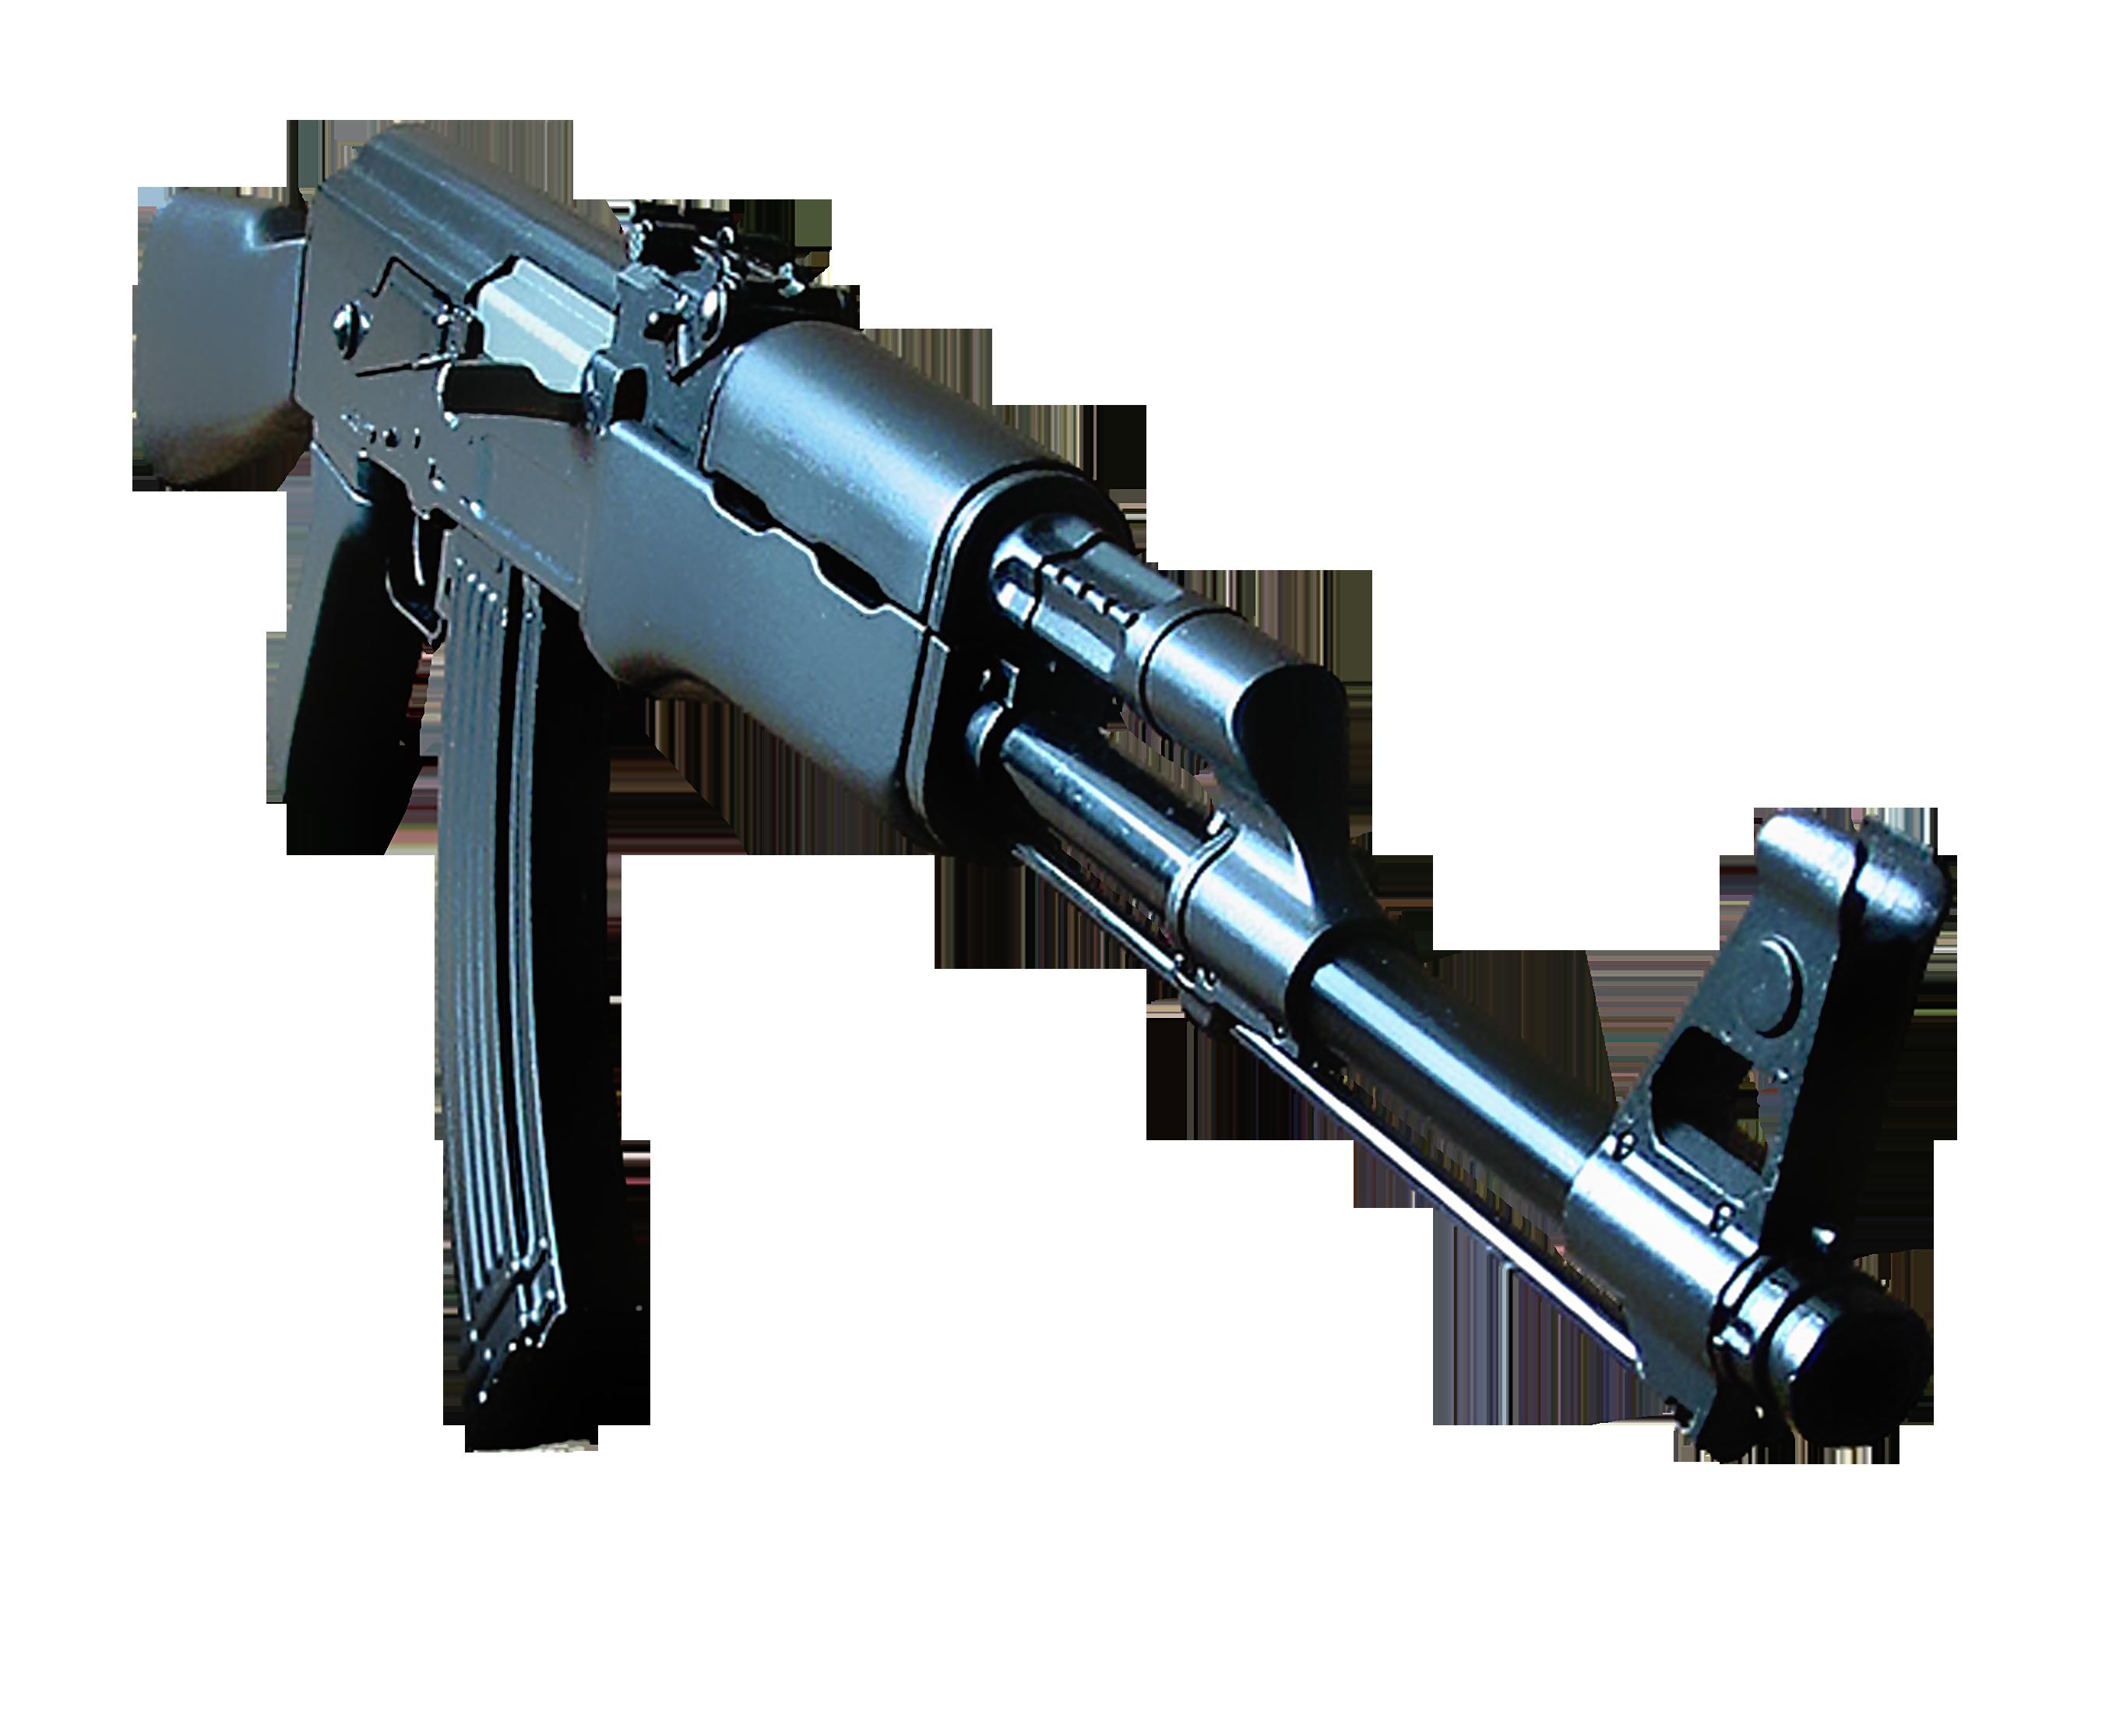 Steel Ak-47 PNG Image